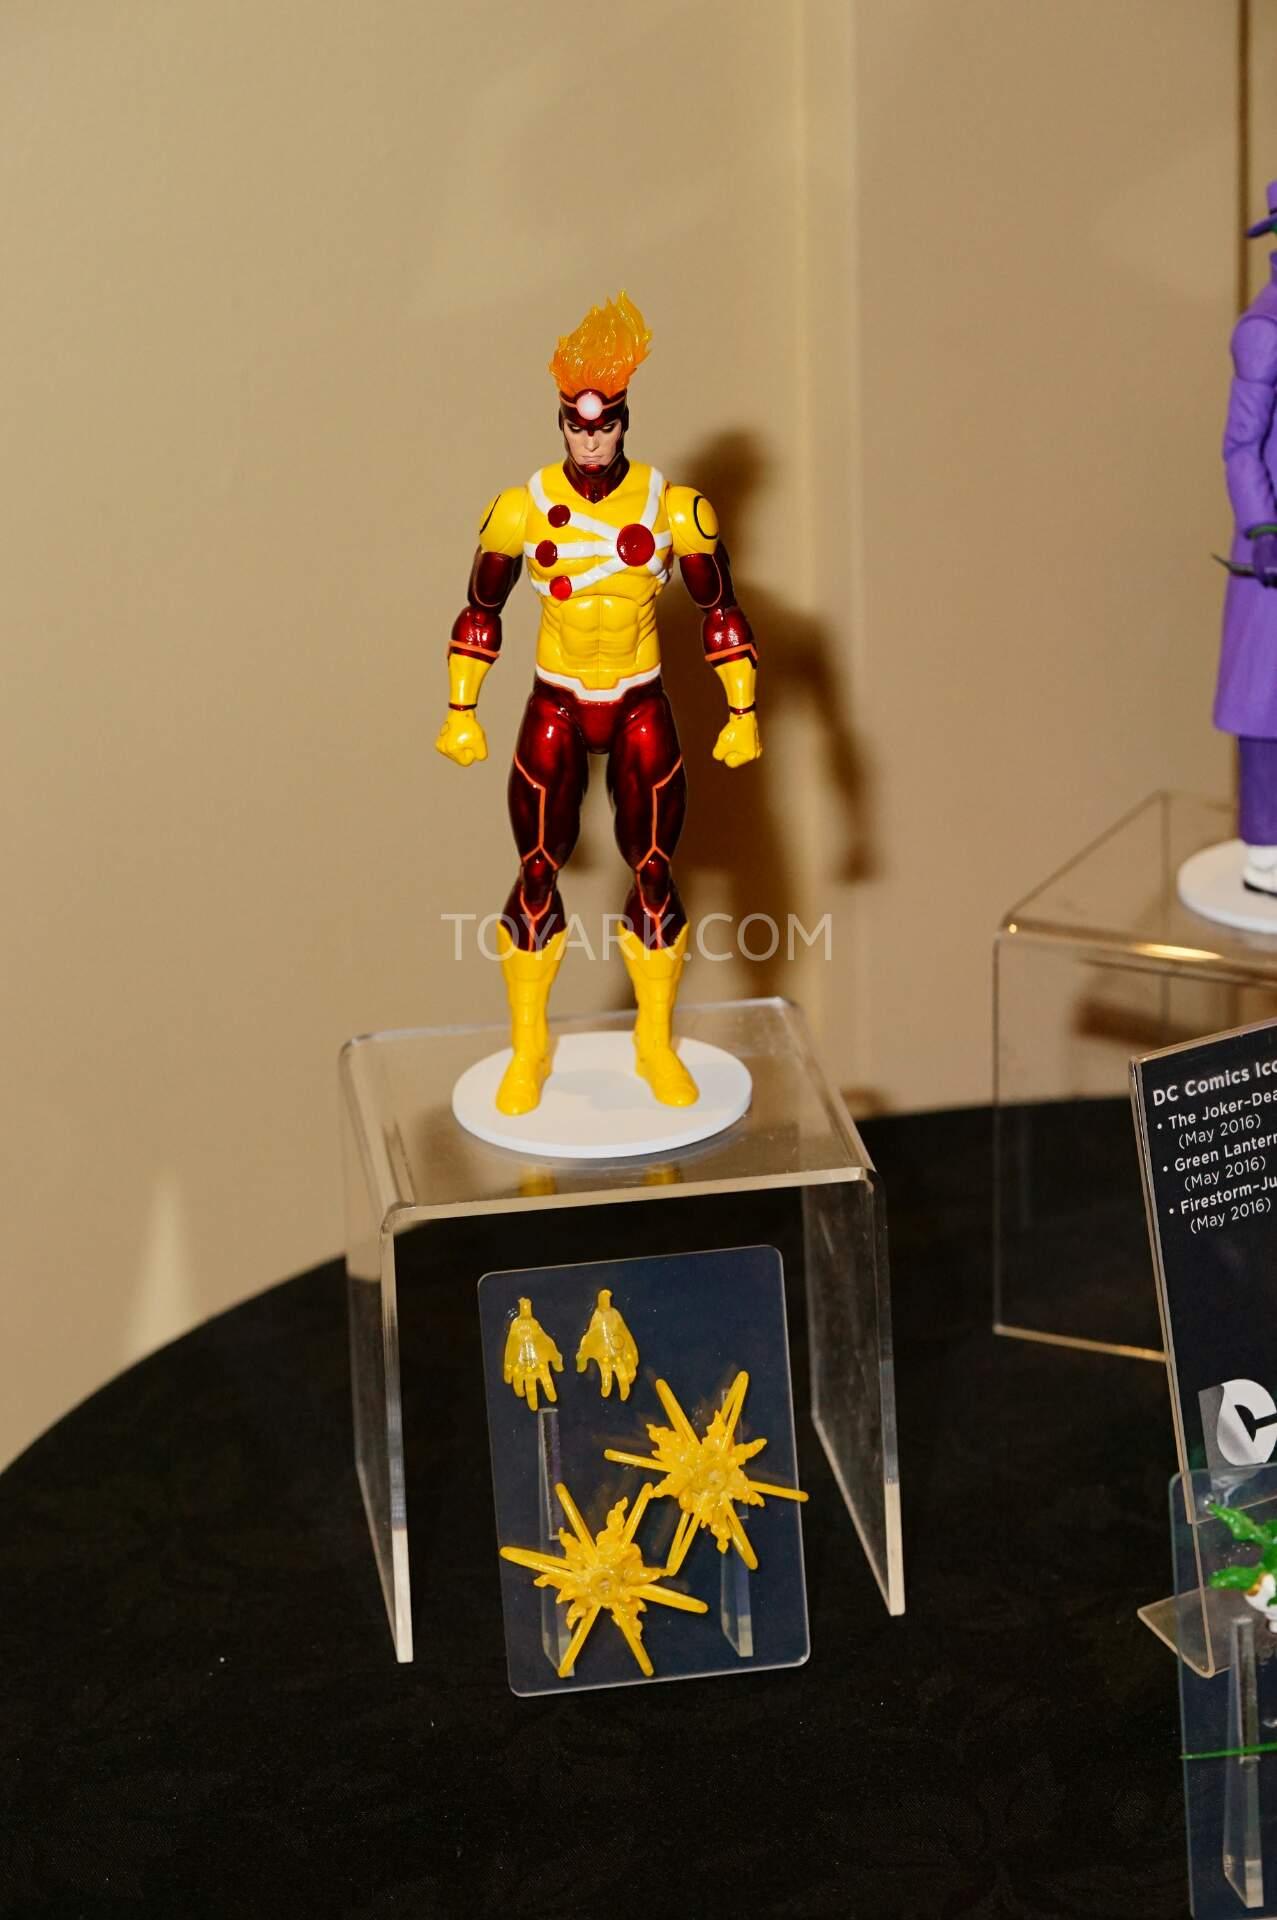 [Action Figures] Todo sobre Action Figures, Hot Toys, Sideshows - Página 5 SDCC2015-DC-Collectibles-DC-Icon-Series-001